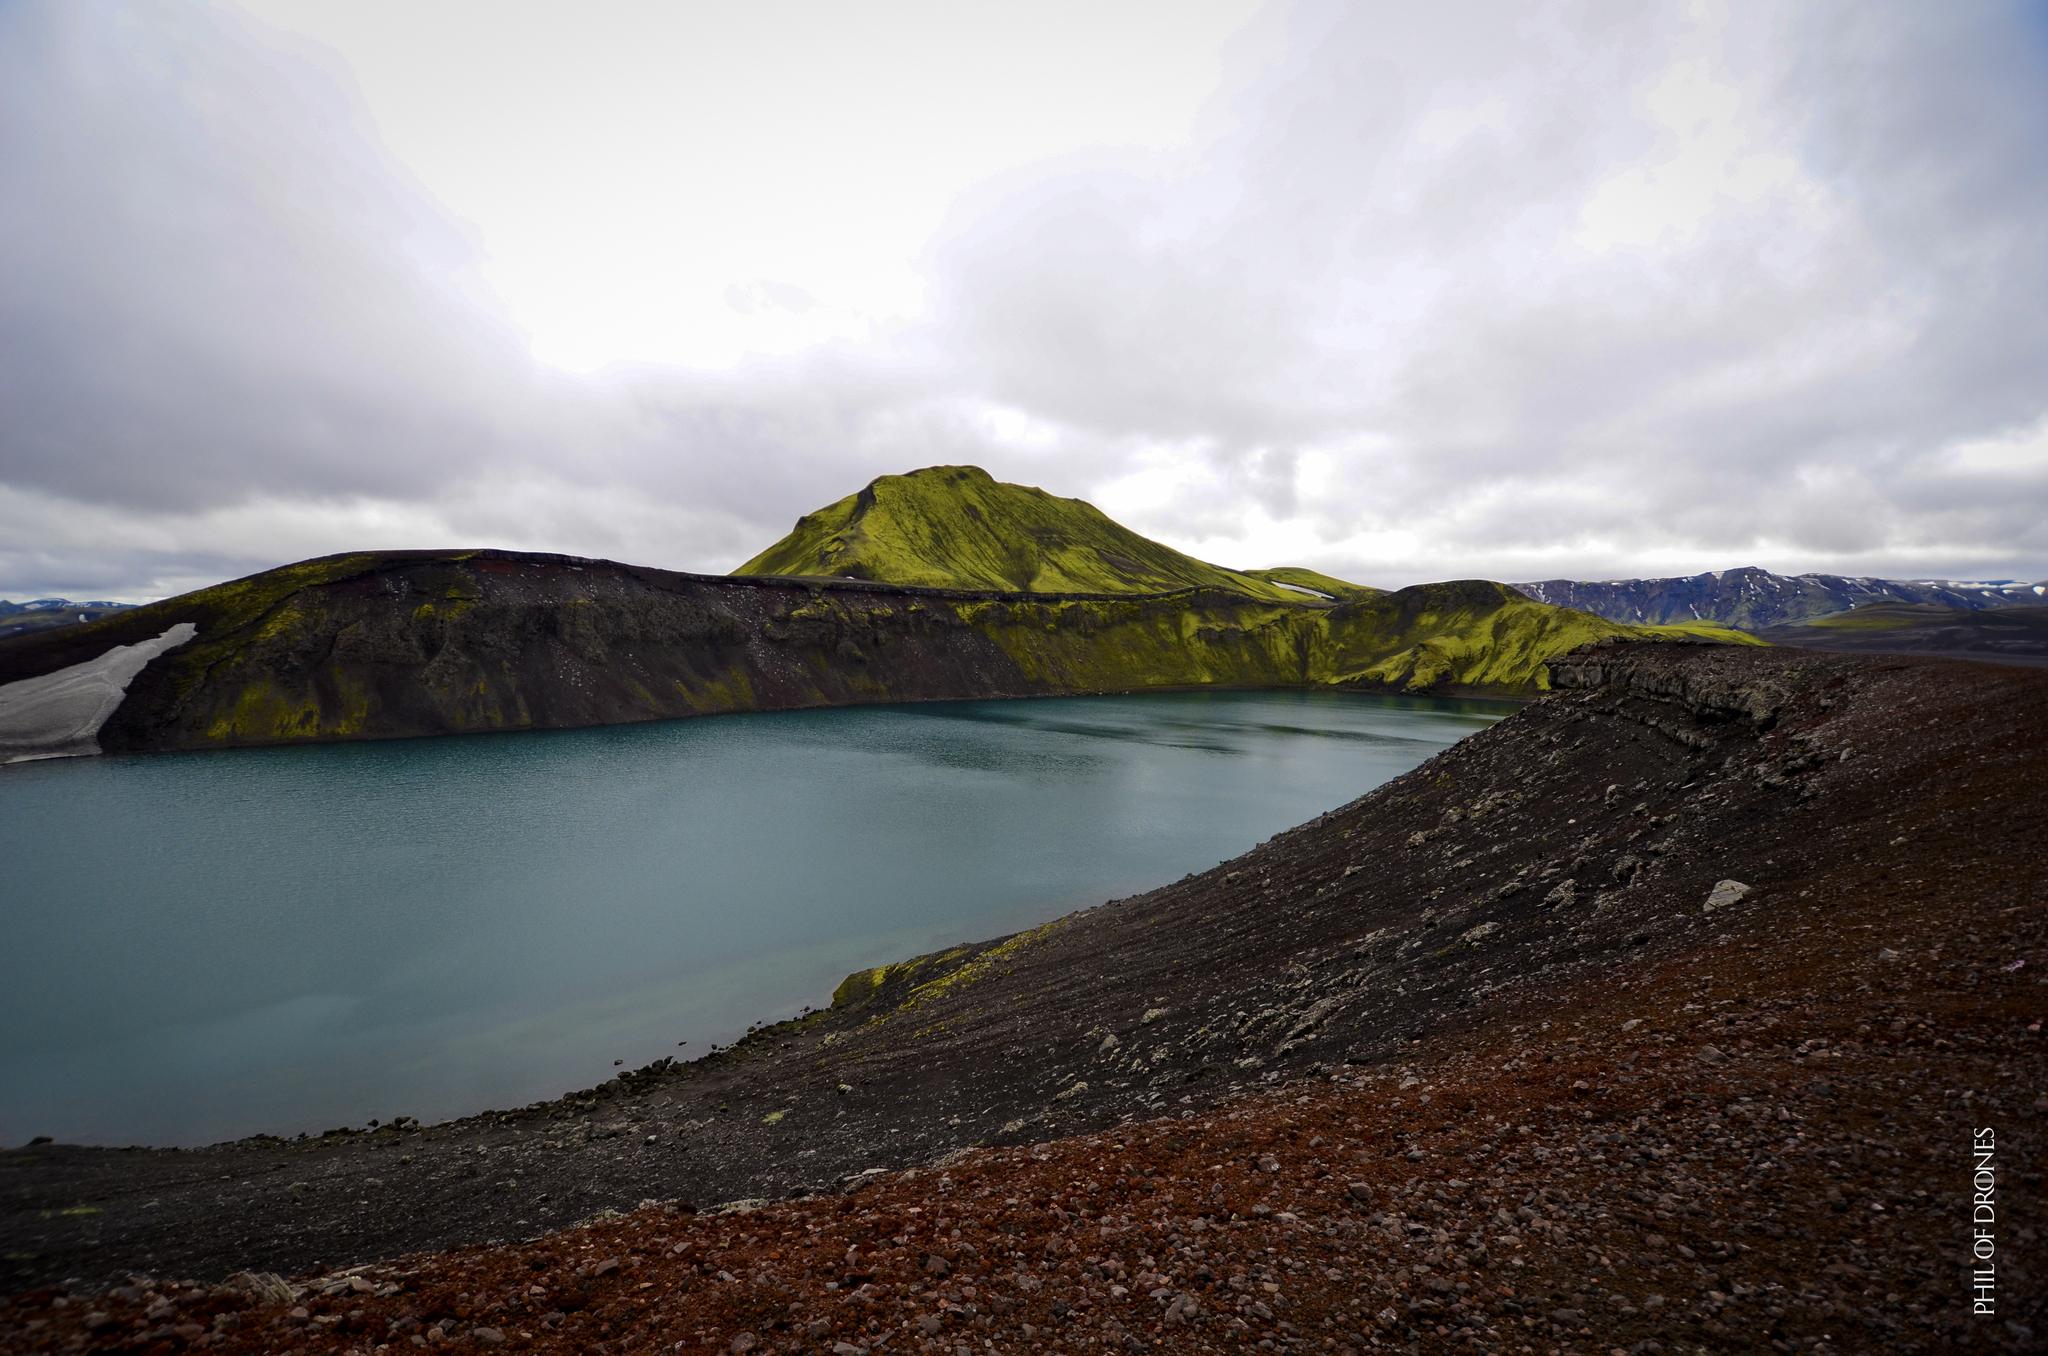 Islande 2013-1-PhM copy.jpg